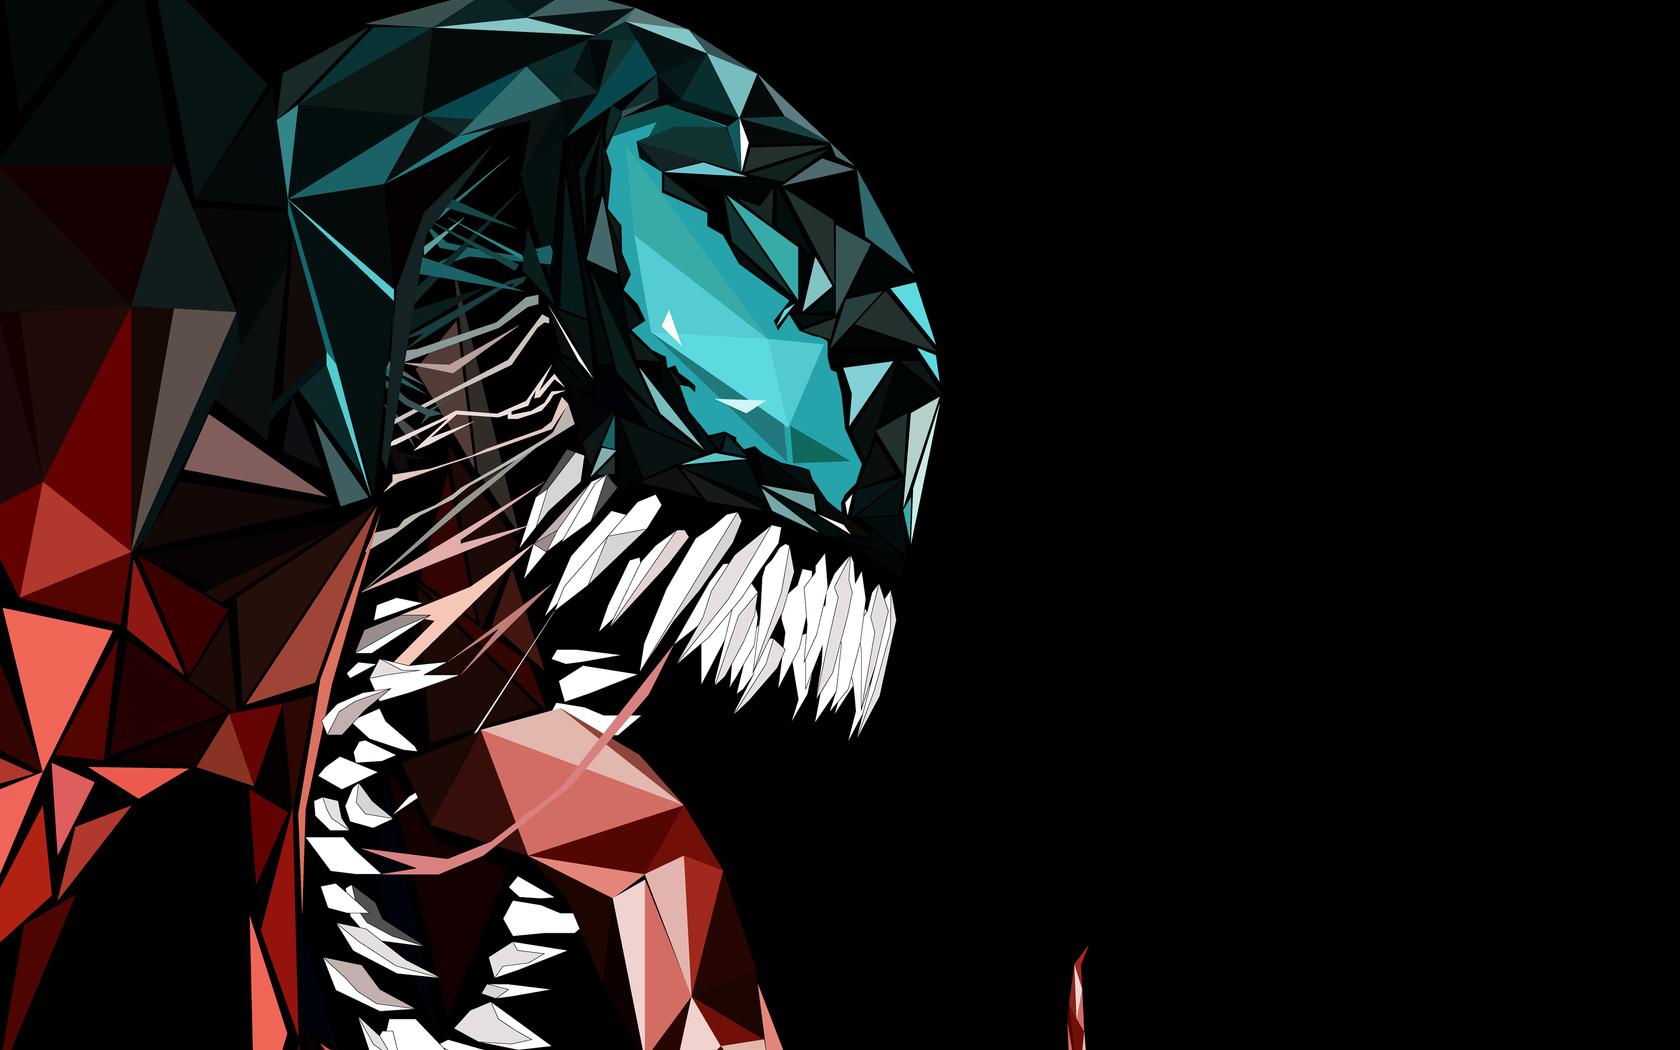 1680x1050 Venom Abstract 4k 1680x1050 Resolution HD 4k ...